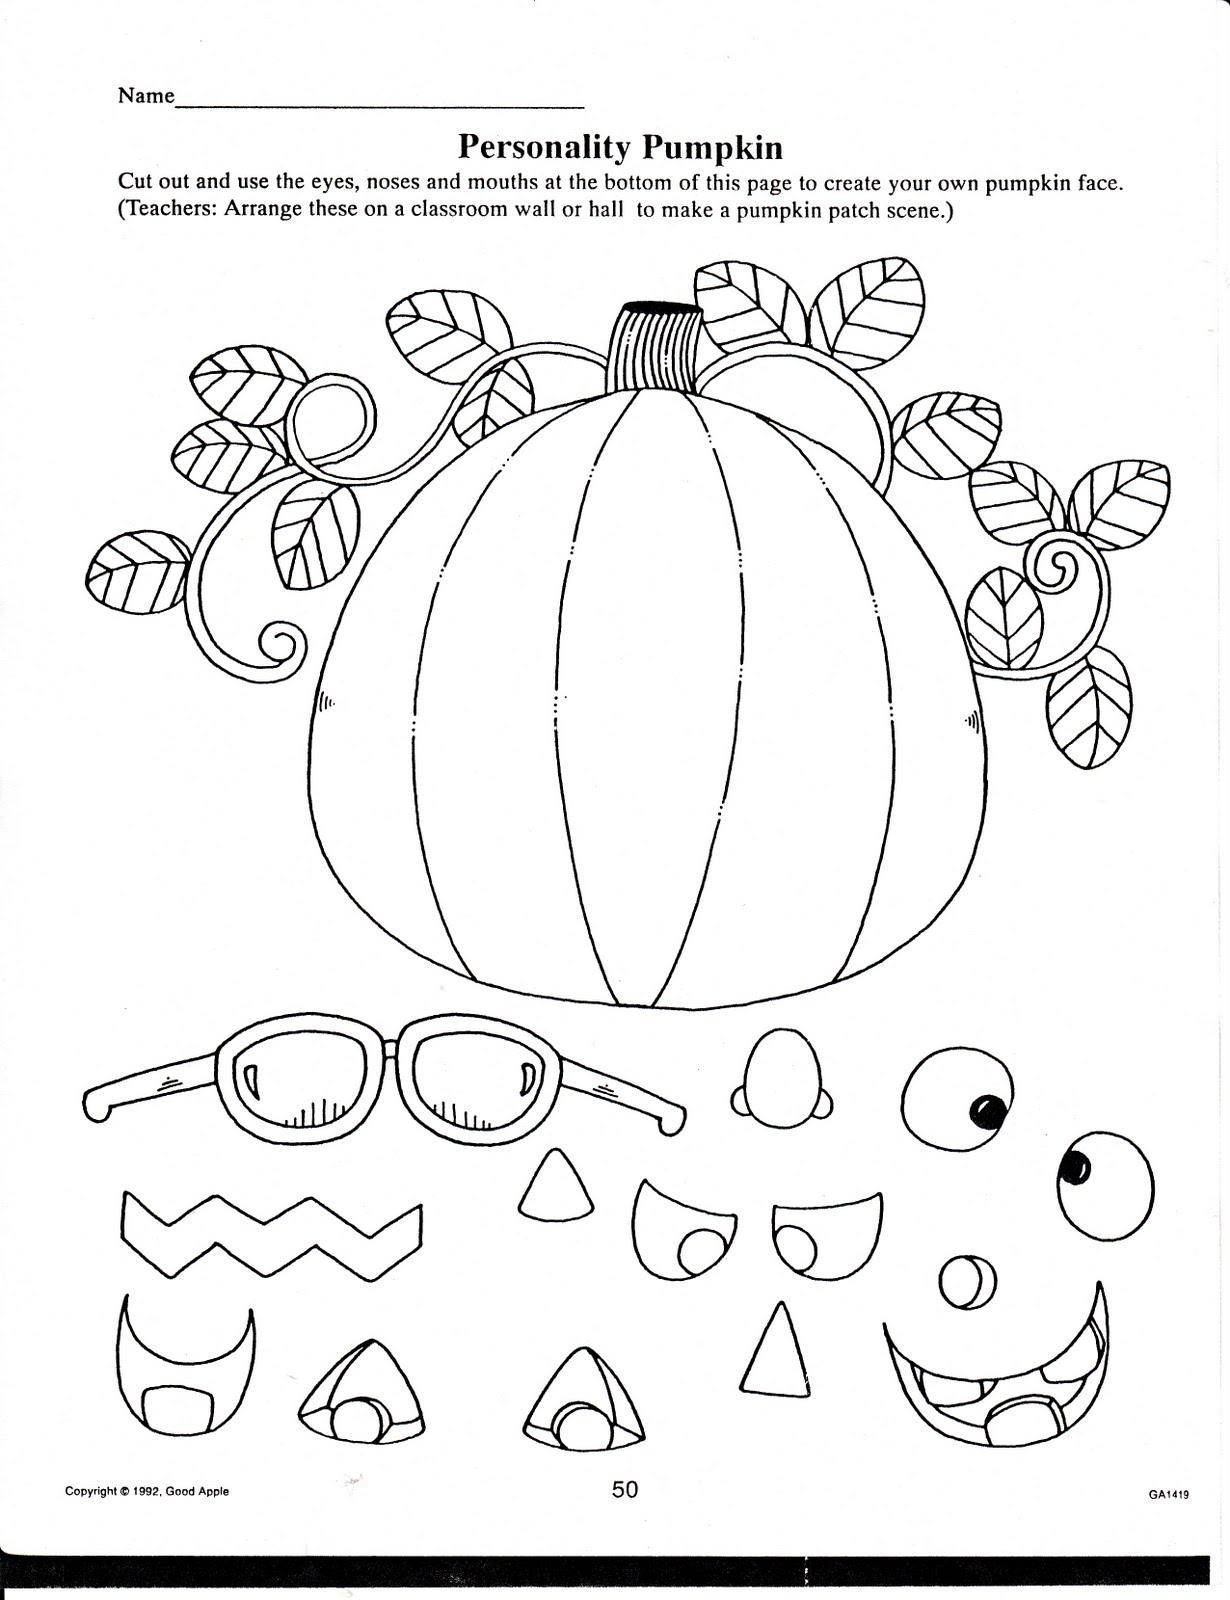 Printable Halloween Worksheets For Preschoolers